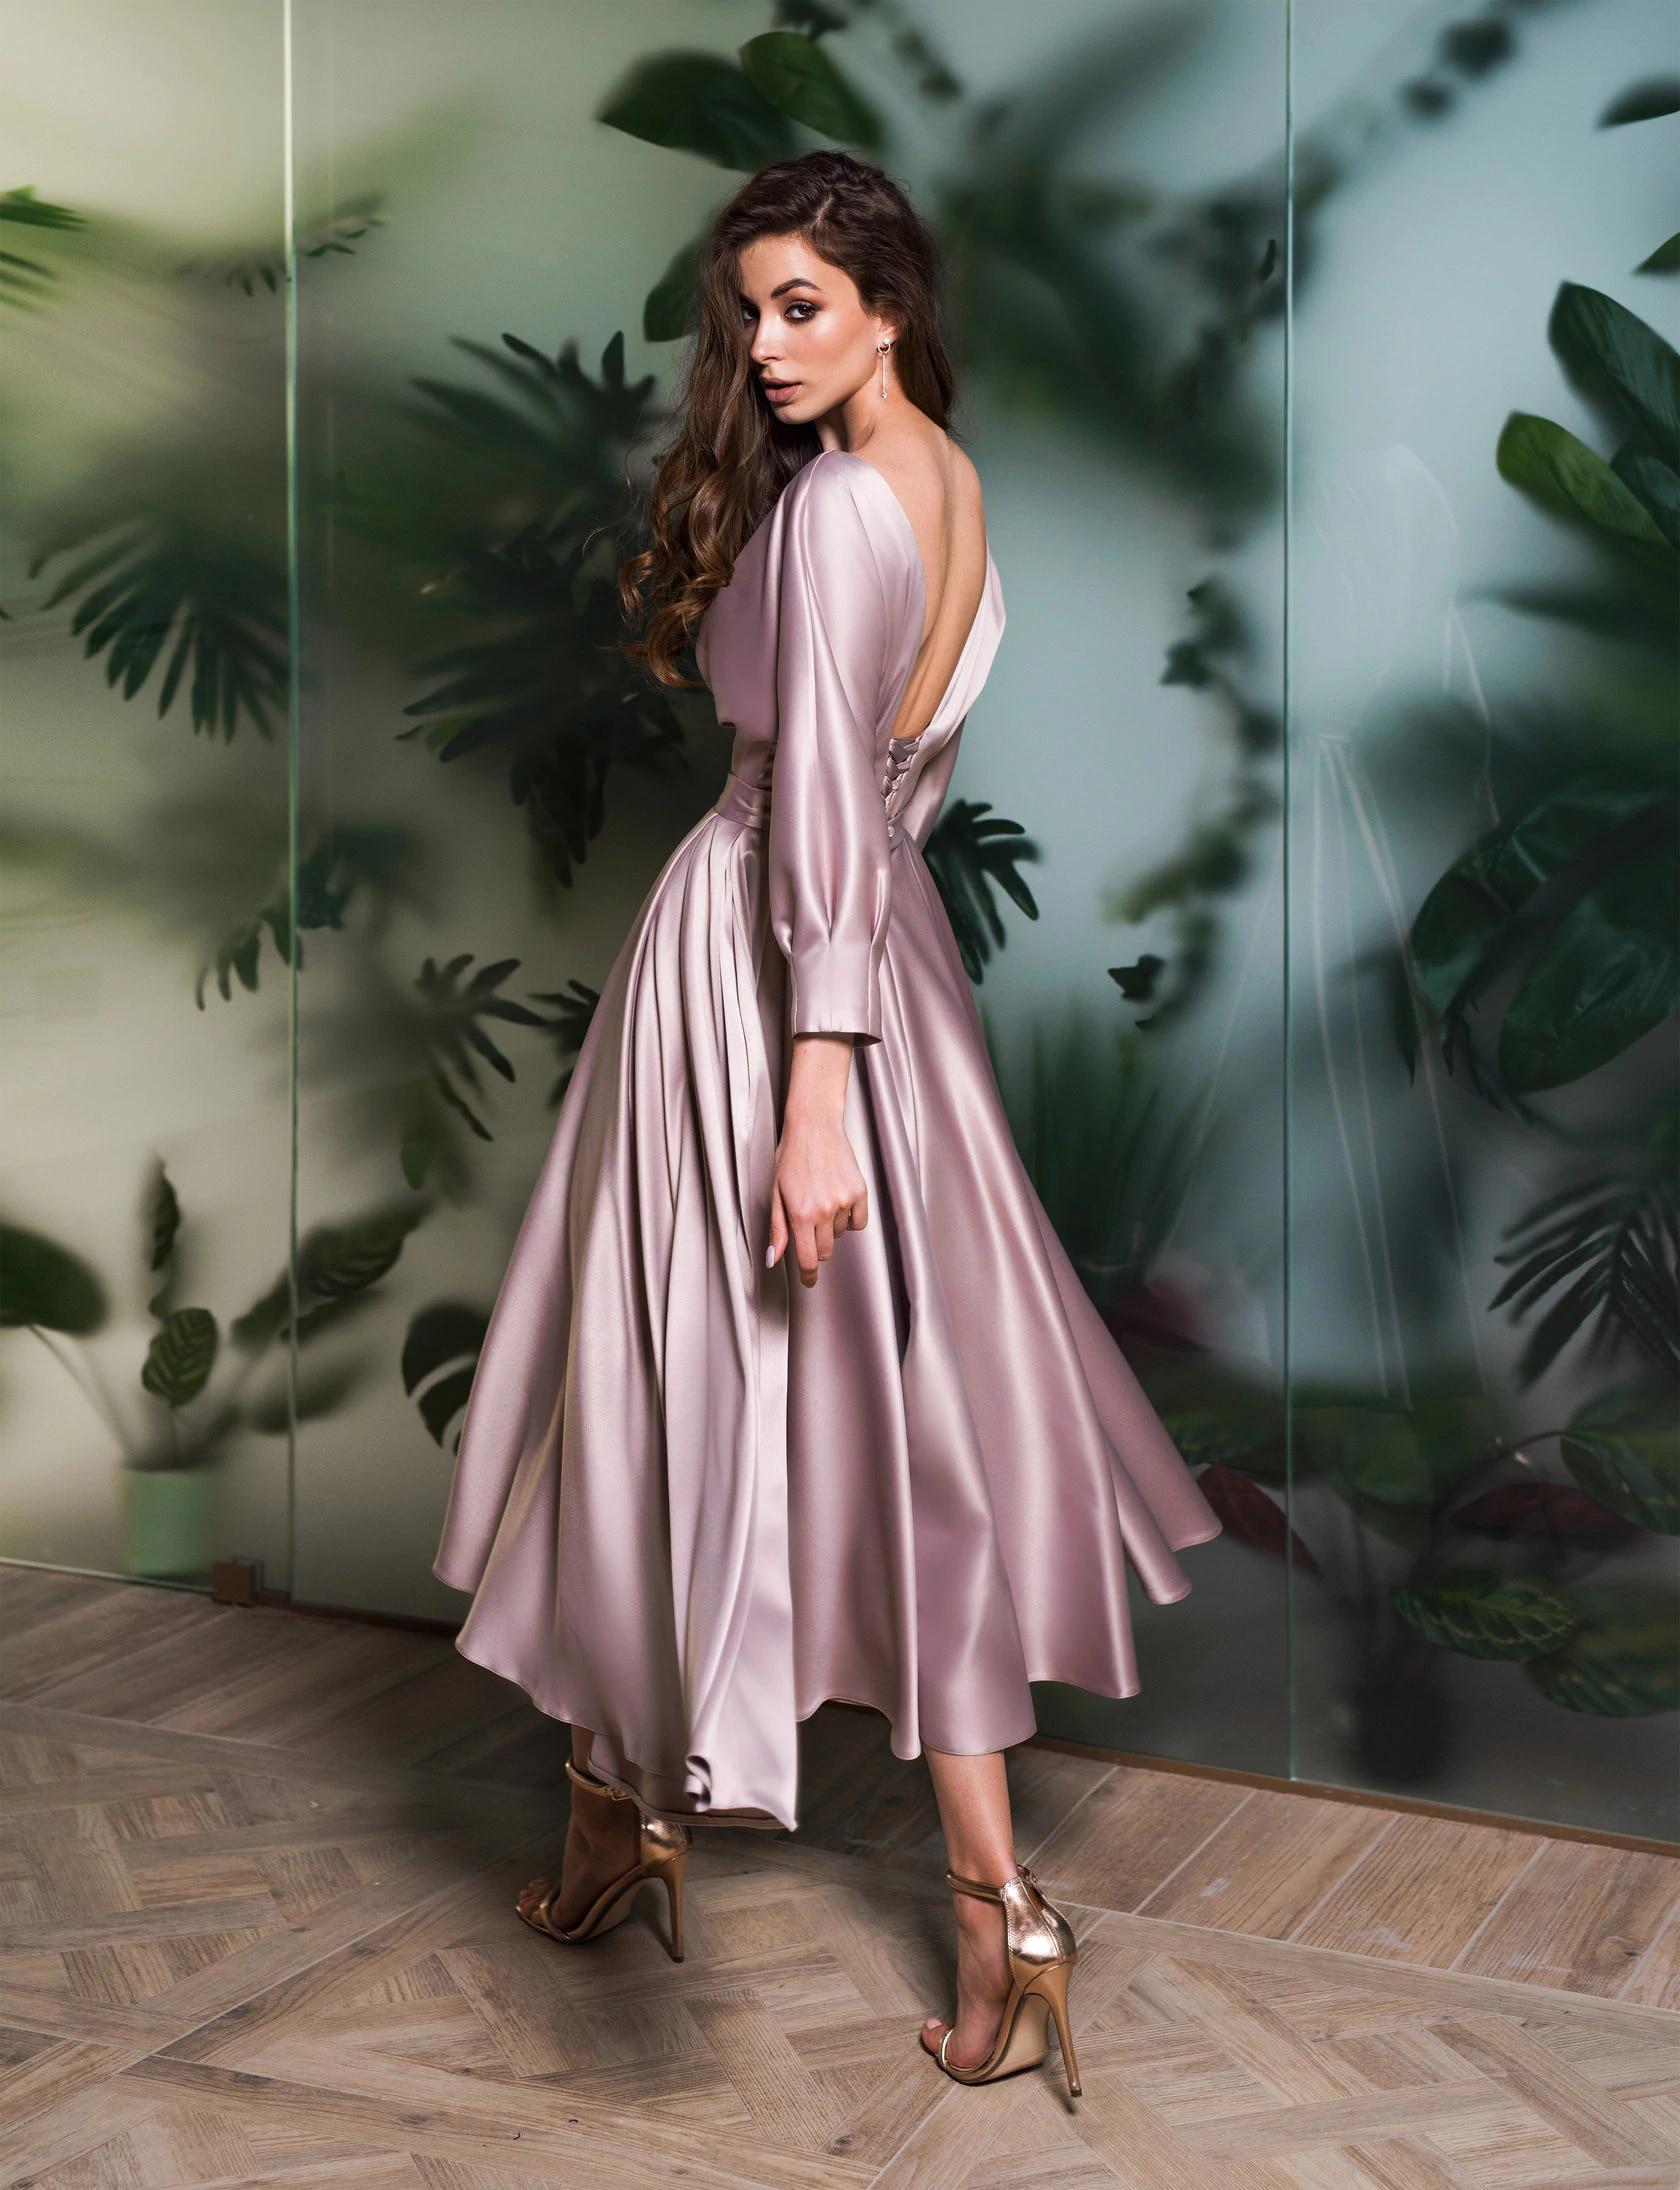 Elegant Satin Backless Evening Dresses 2021 Long Sleeves Tea Length Prom Gowns Sparkle Party Wear Vestidos De Noiva